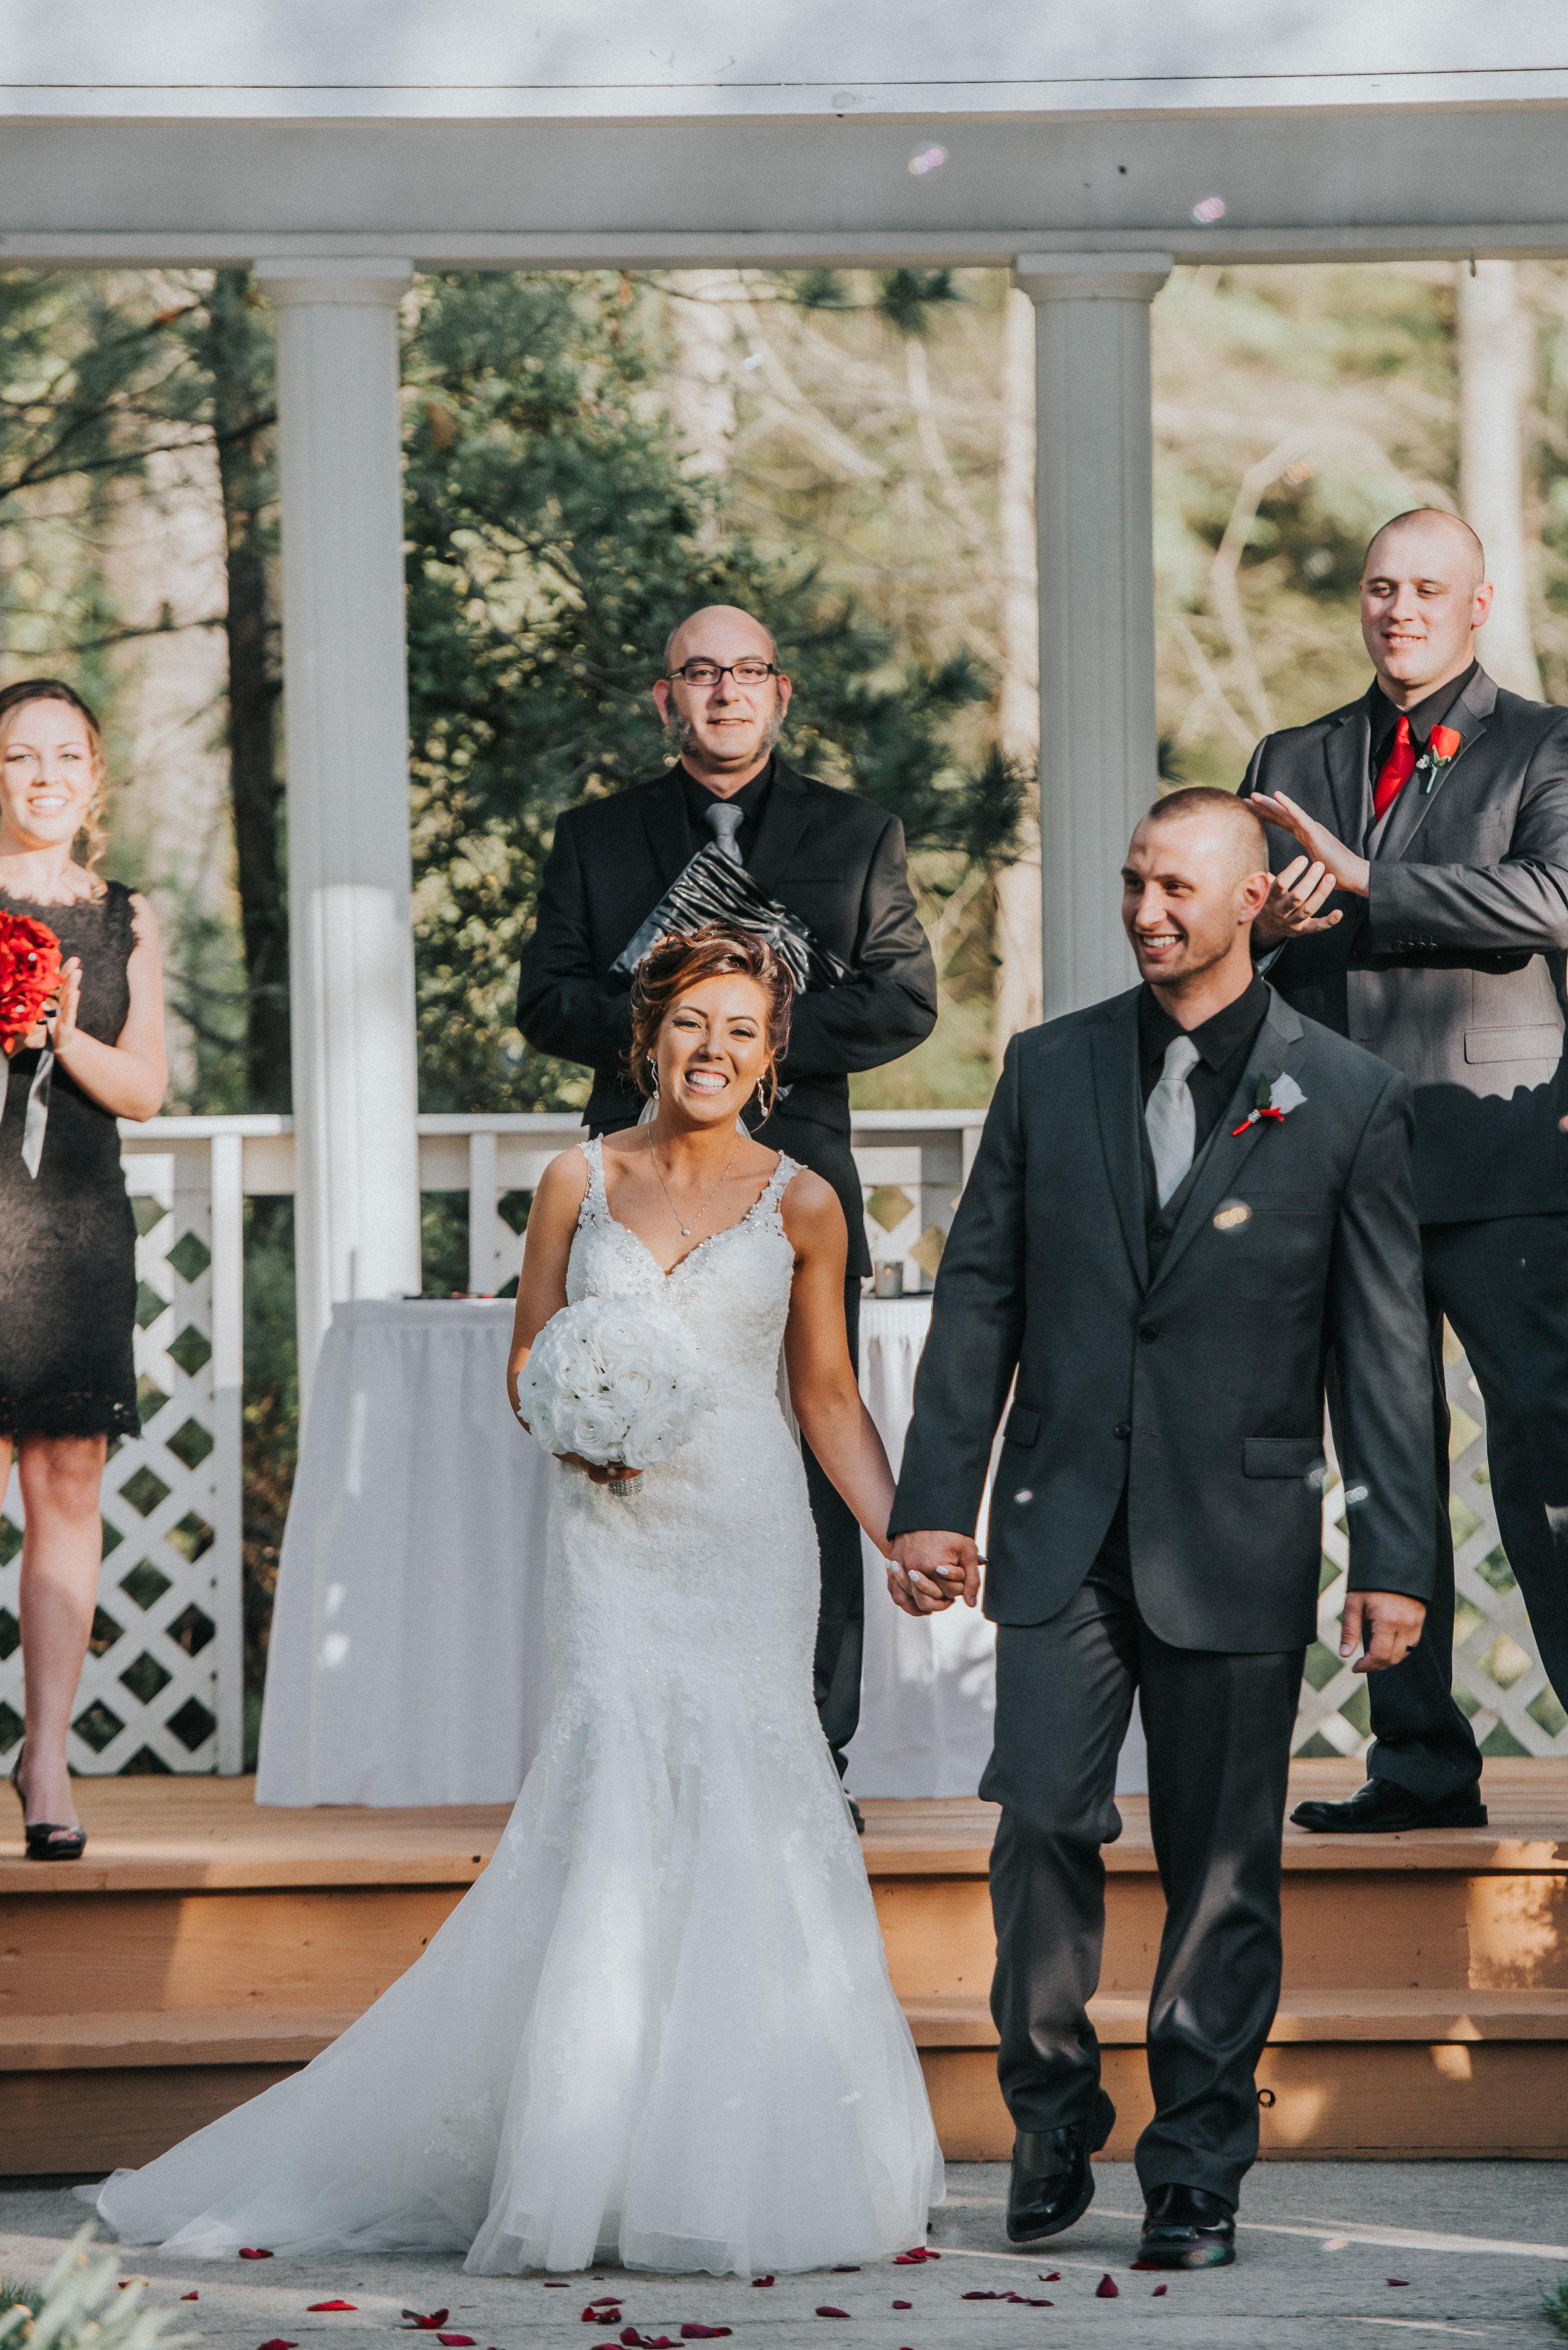 Christina-and-Gene-Wedding-Marla-Rain-Photography-357.jpg